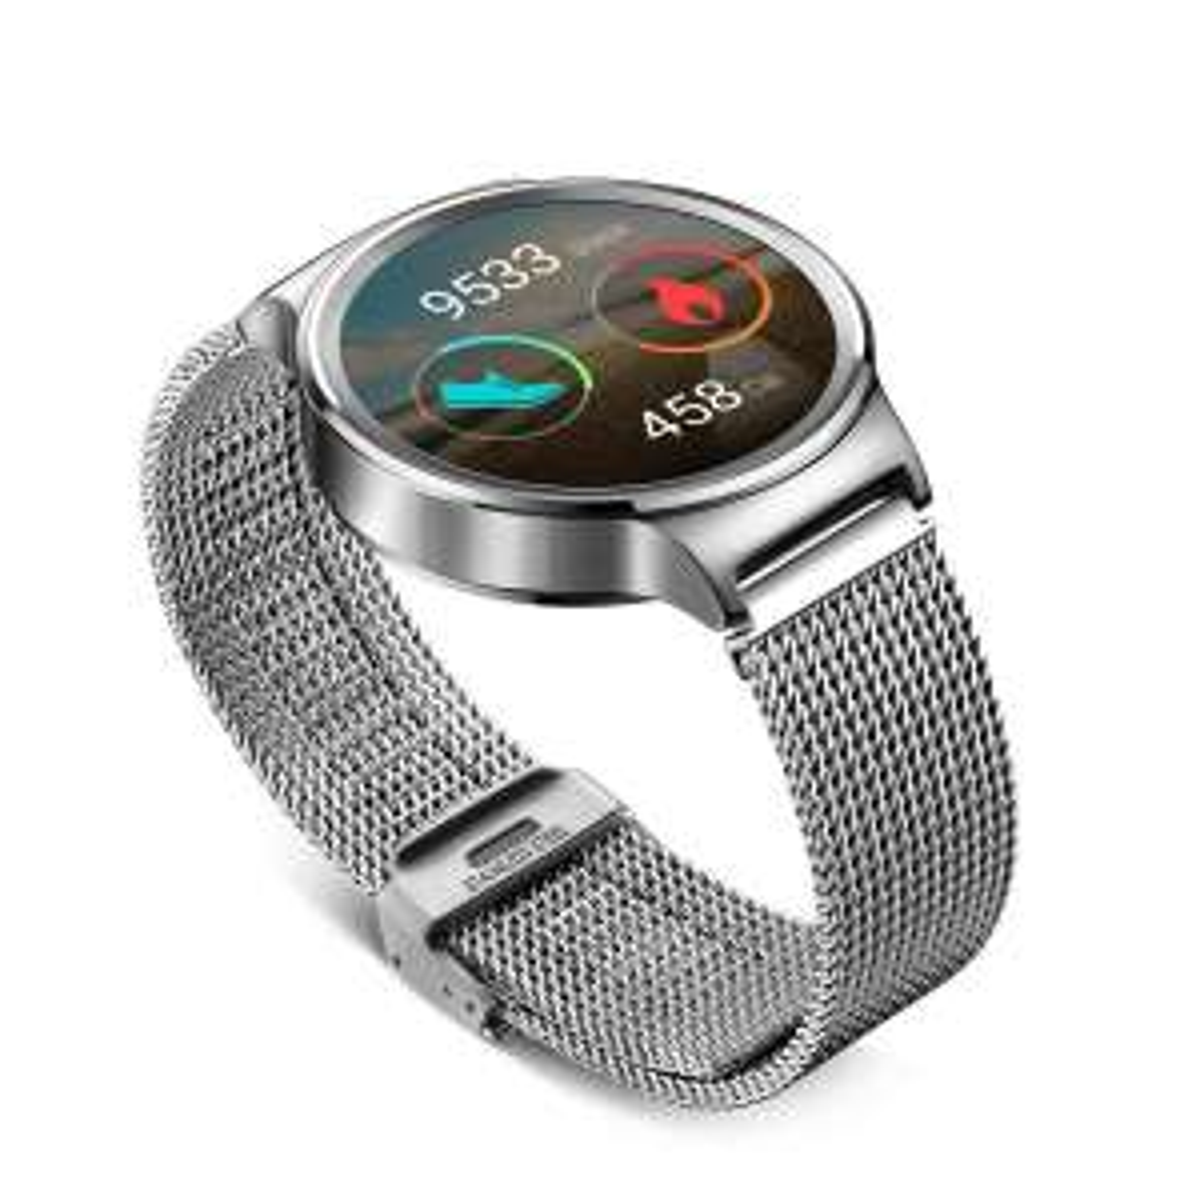 Huawei Watch Classic (gewoven stalen band) voor €287,71 na code @ Amazon.fr